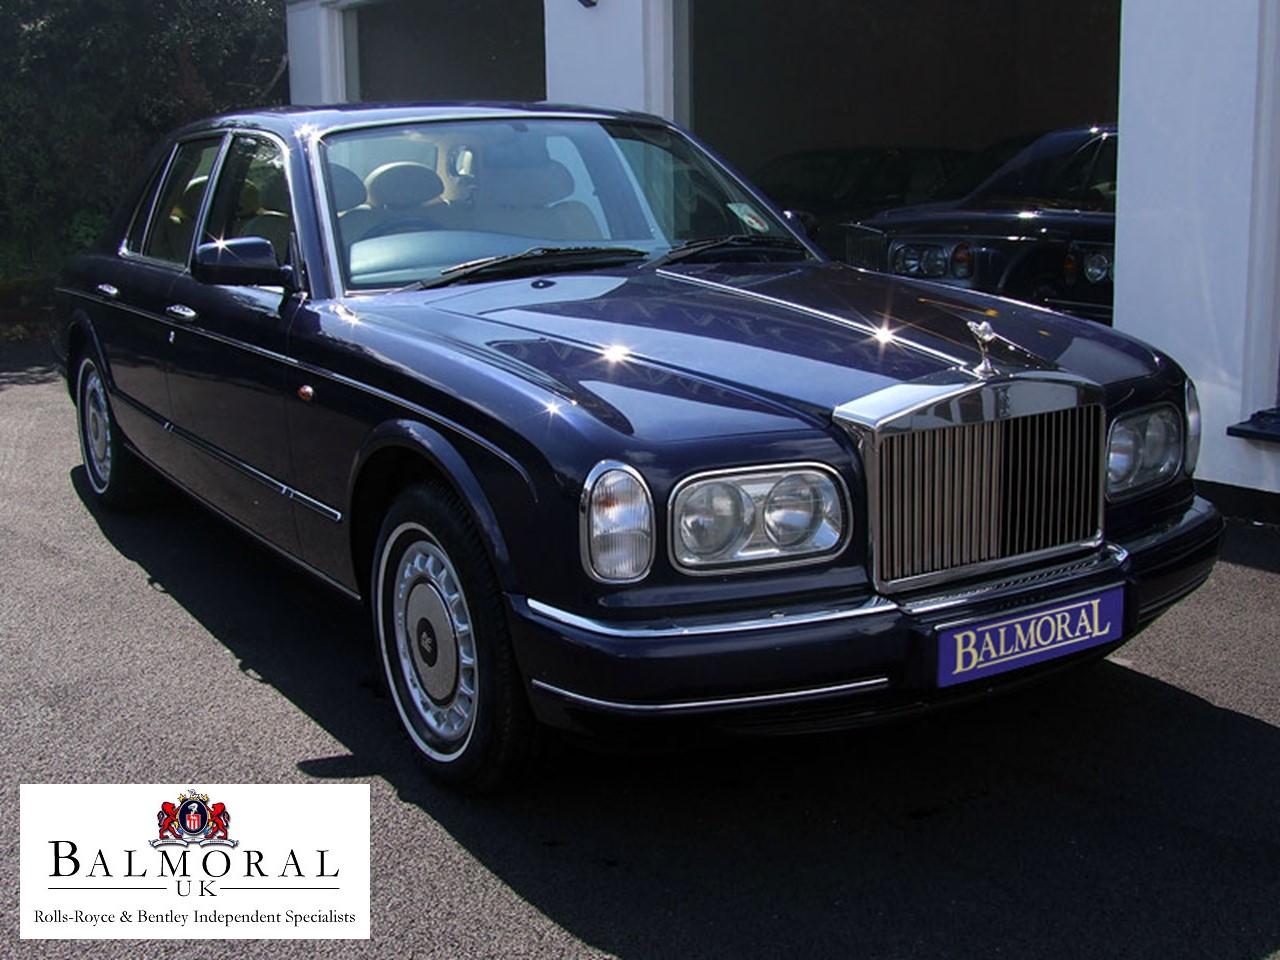 The Last Dance Rolls Royce And Bentley Notoriousluxury